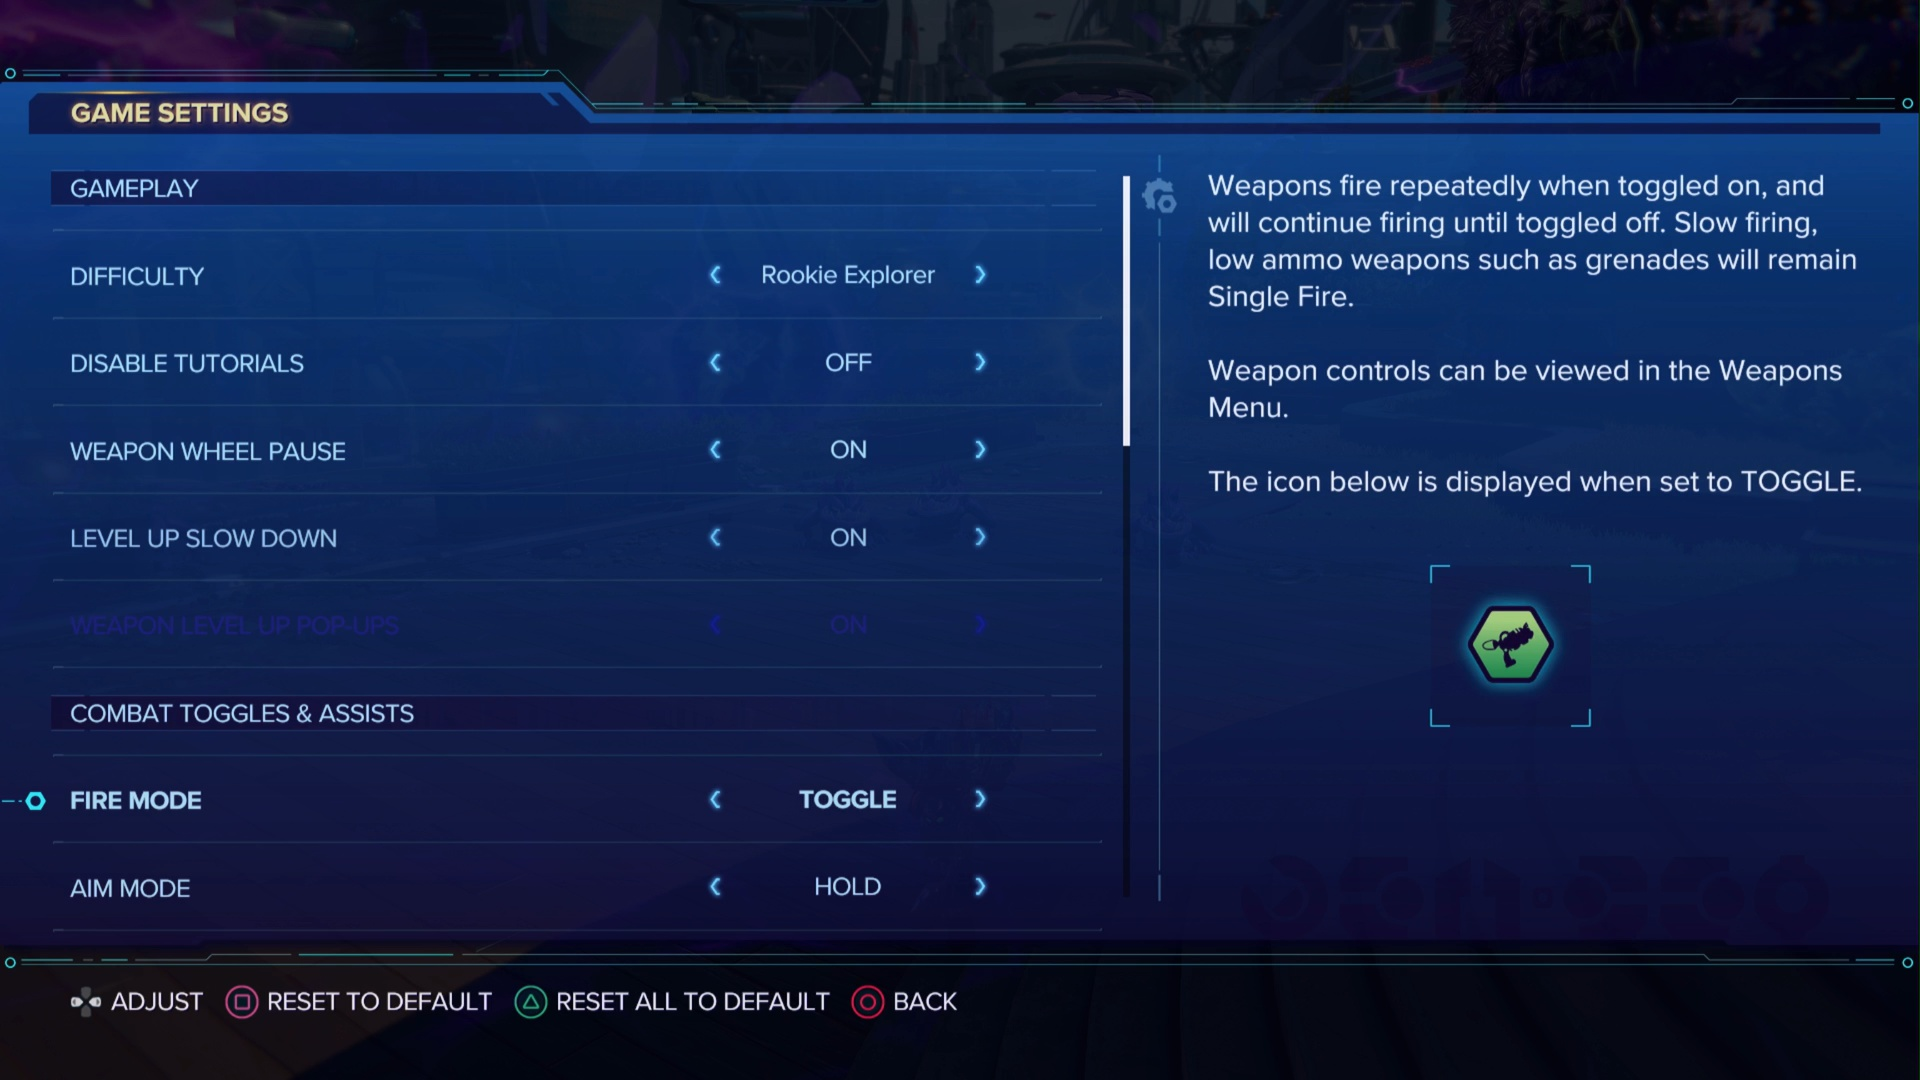 A screenshot showing the game settings